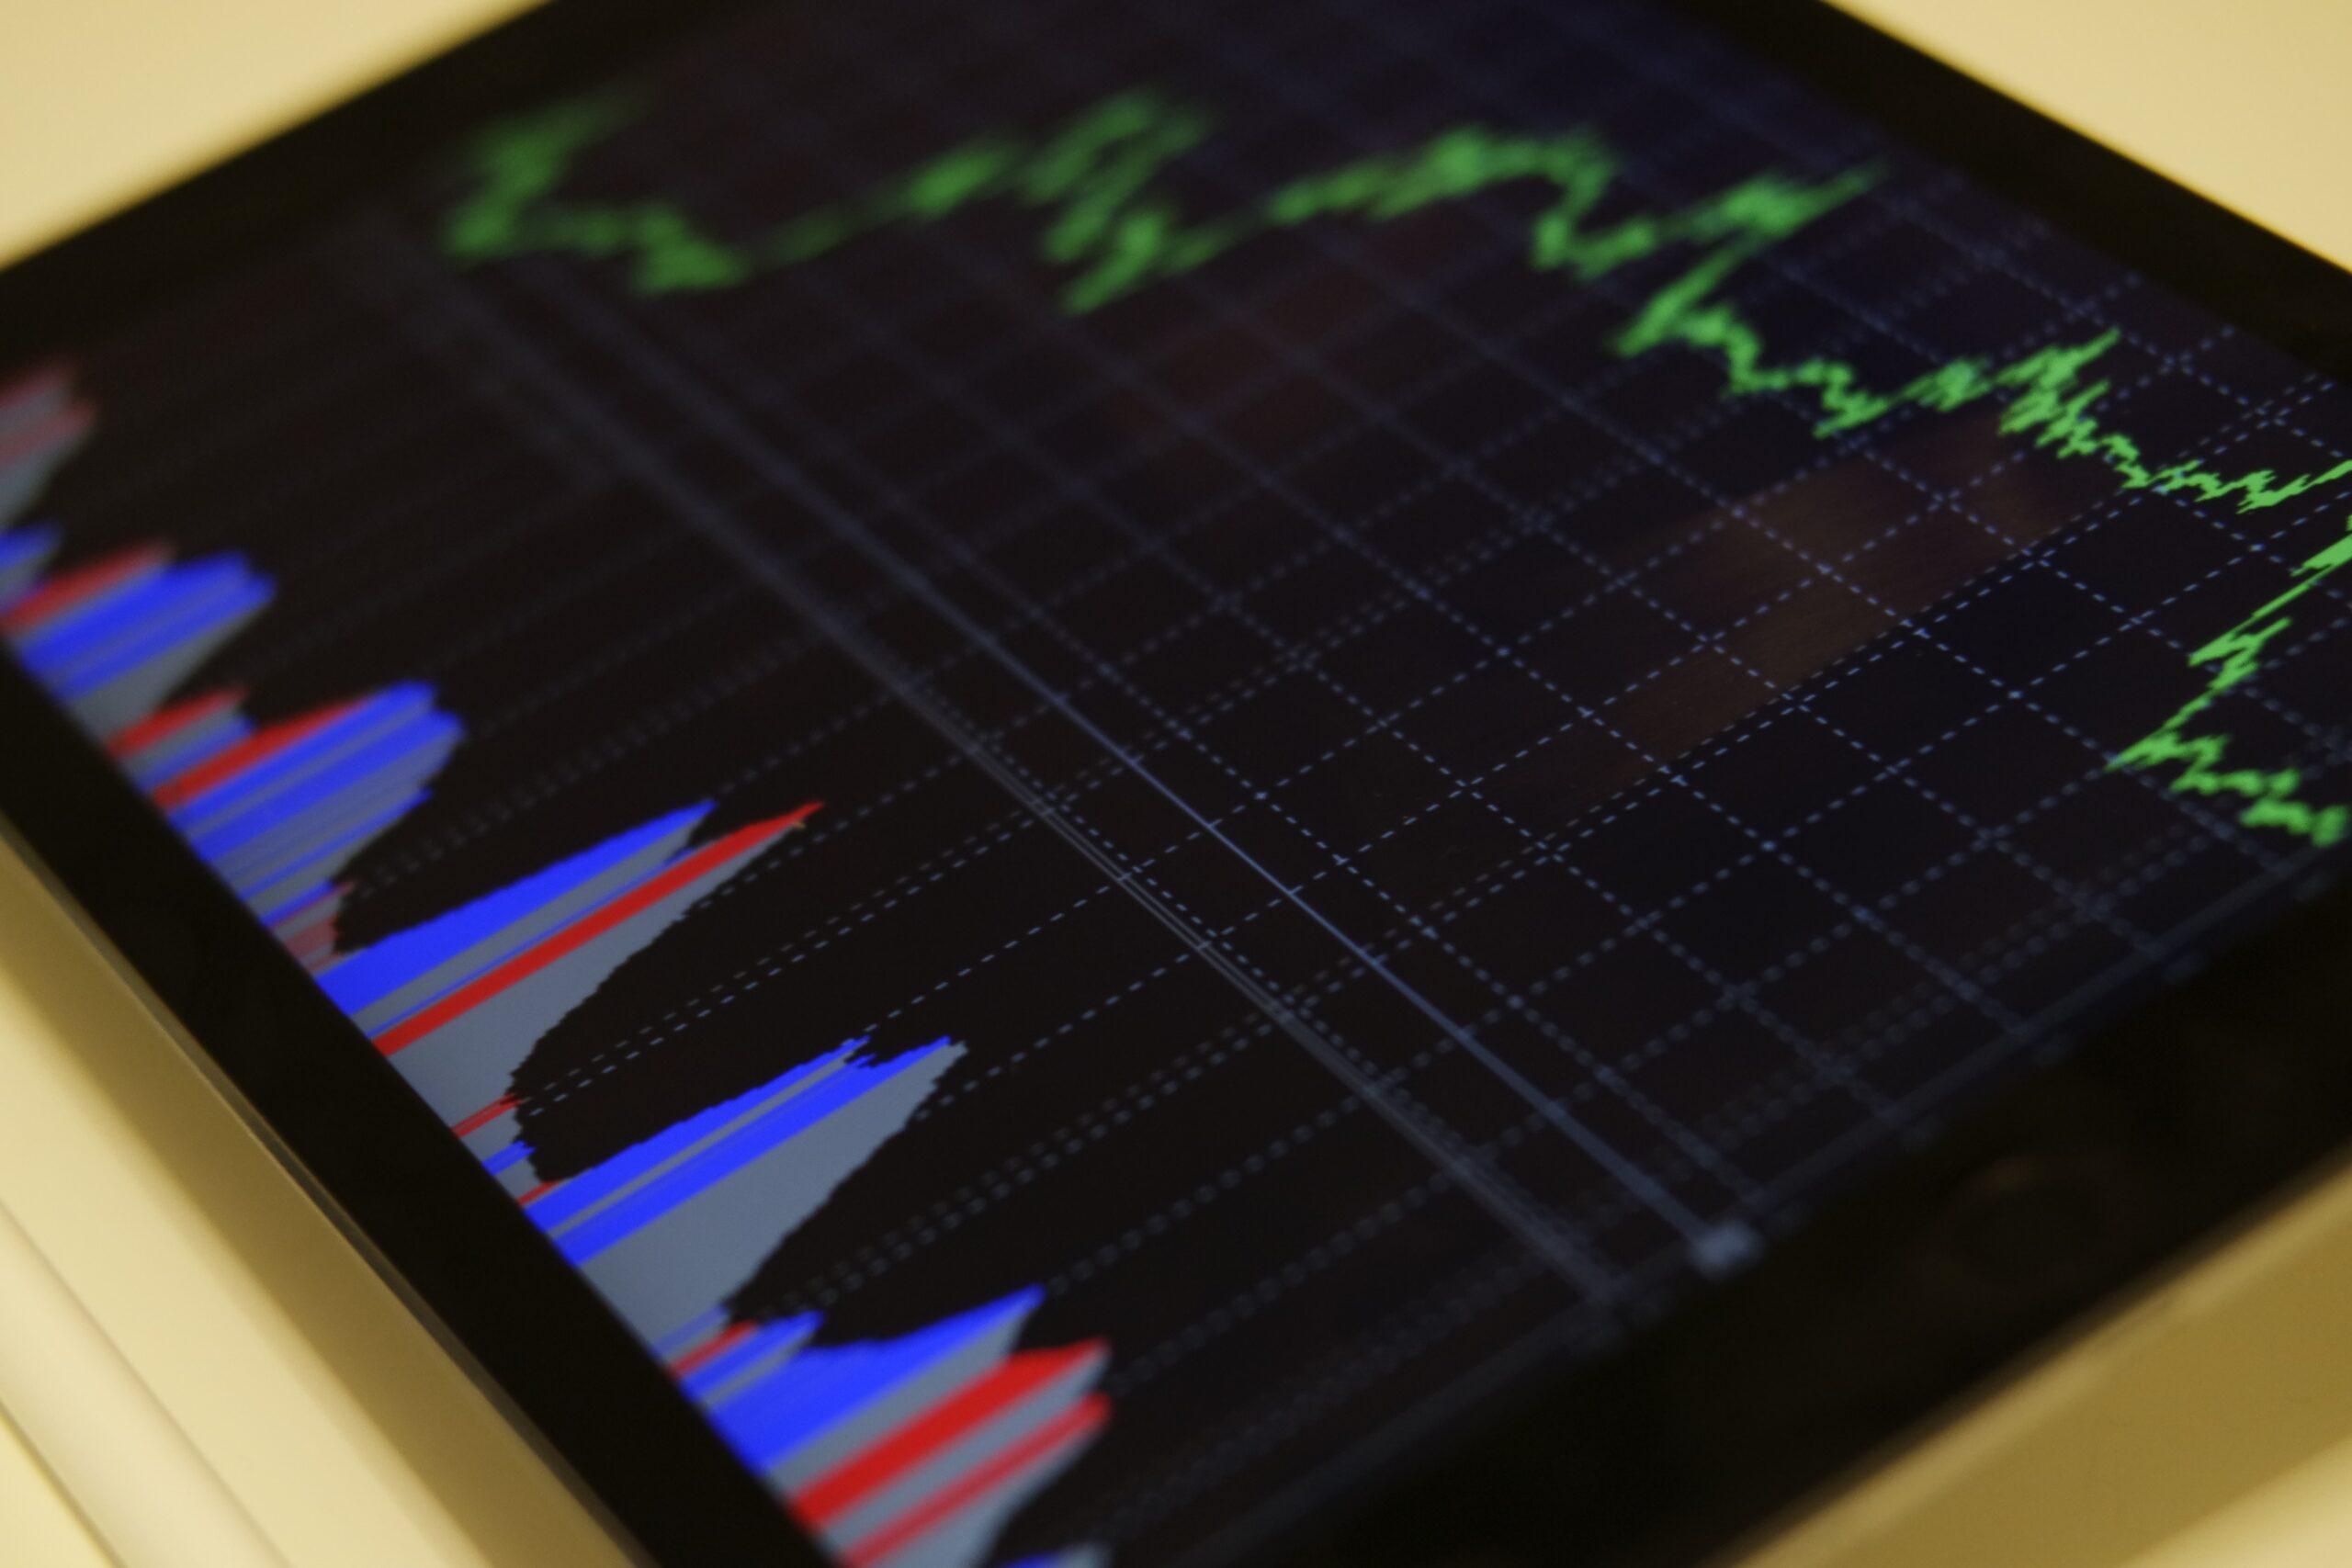 How Trading Platforms Evolved Over Time